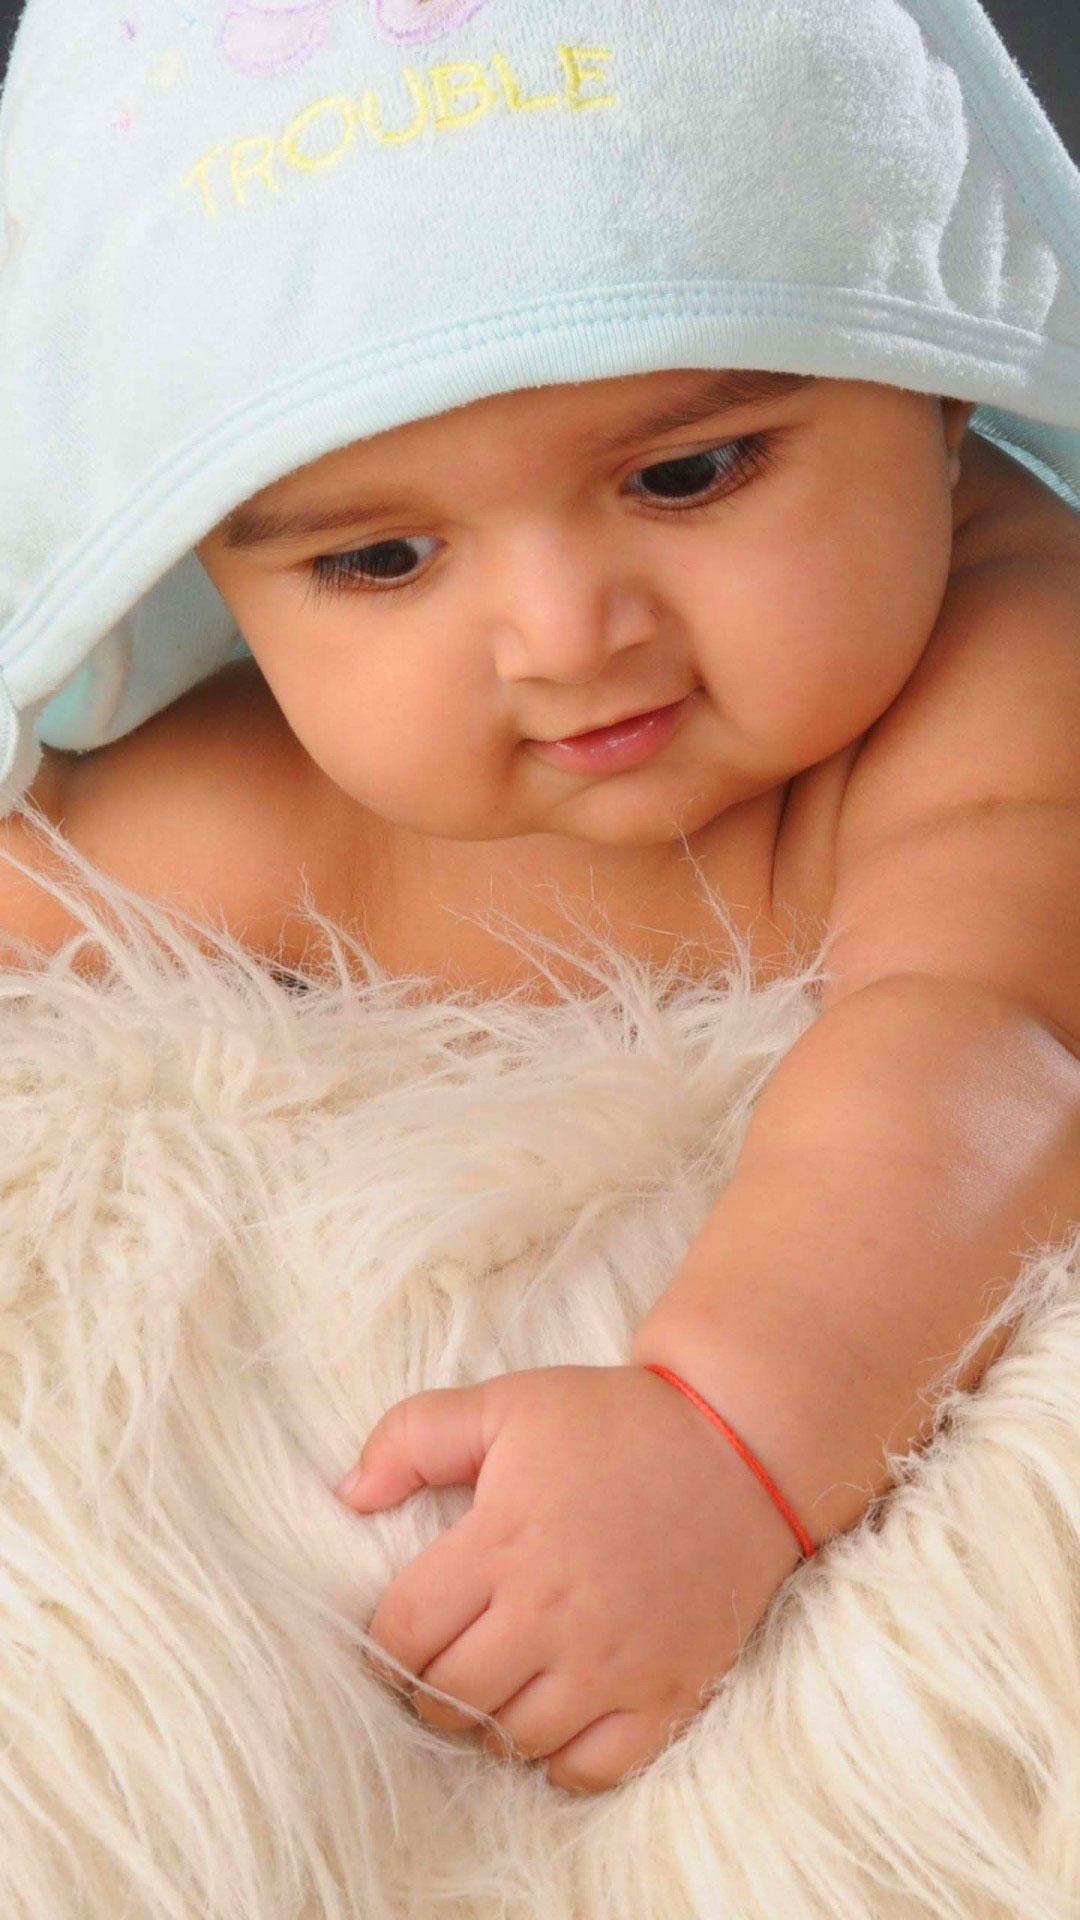 Beautiful Baby Pics For Dp : beautiful, Girls, Whatsapp, Images, Mobile, Morning, Photo, Downlaod, Wallpaper